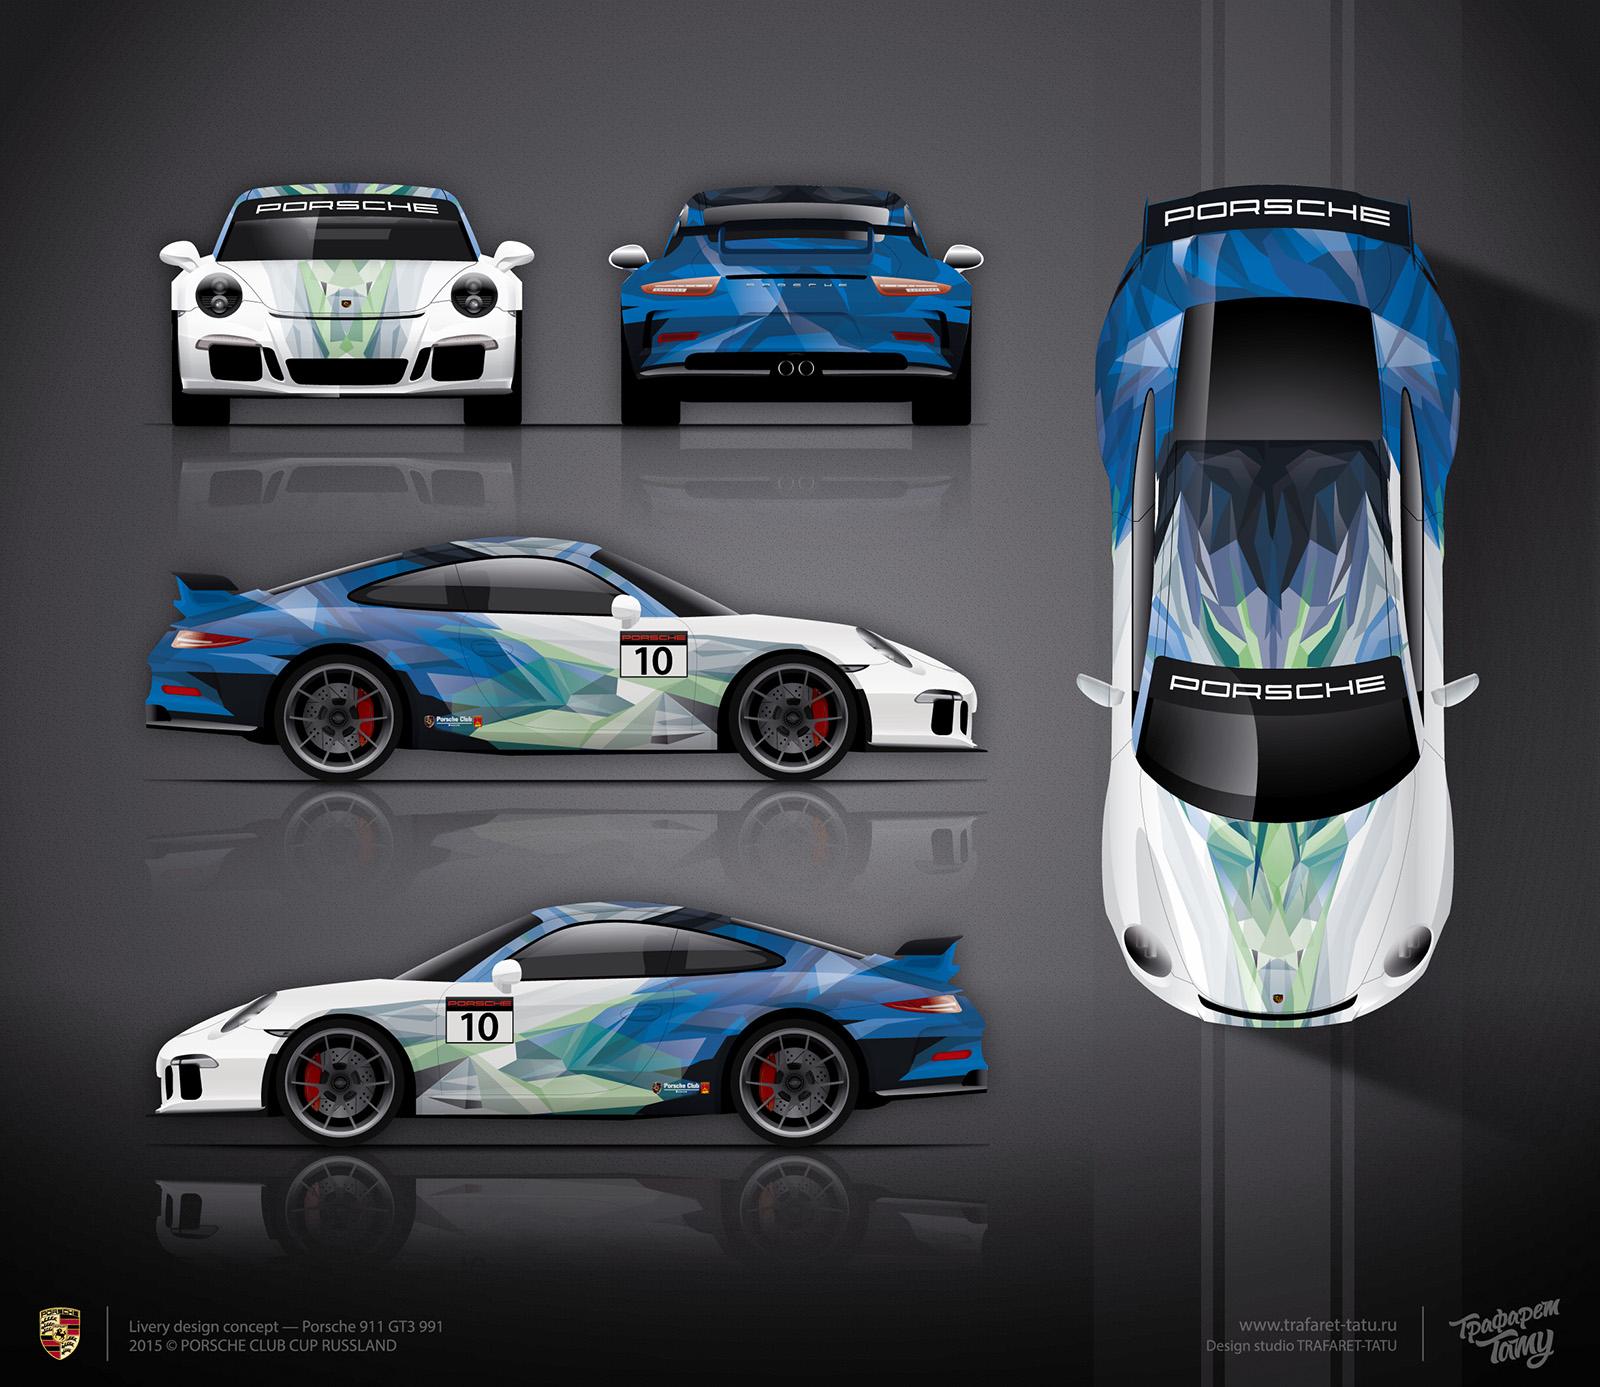 Cars Fractals Race wallpapers, Vehicles, HQ Cars Fractals